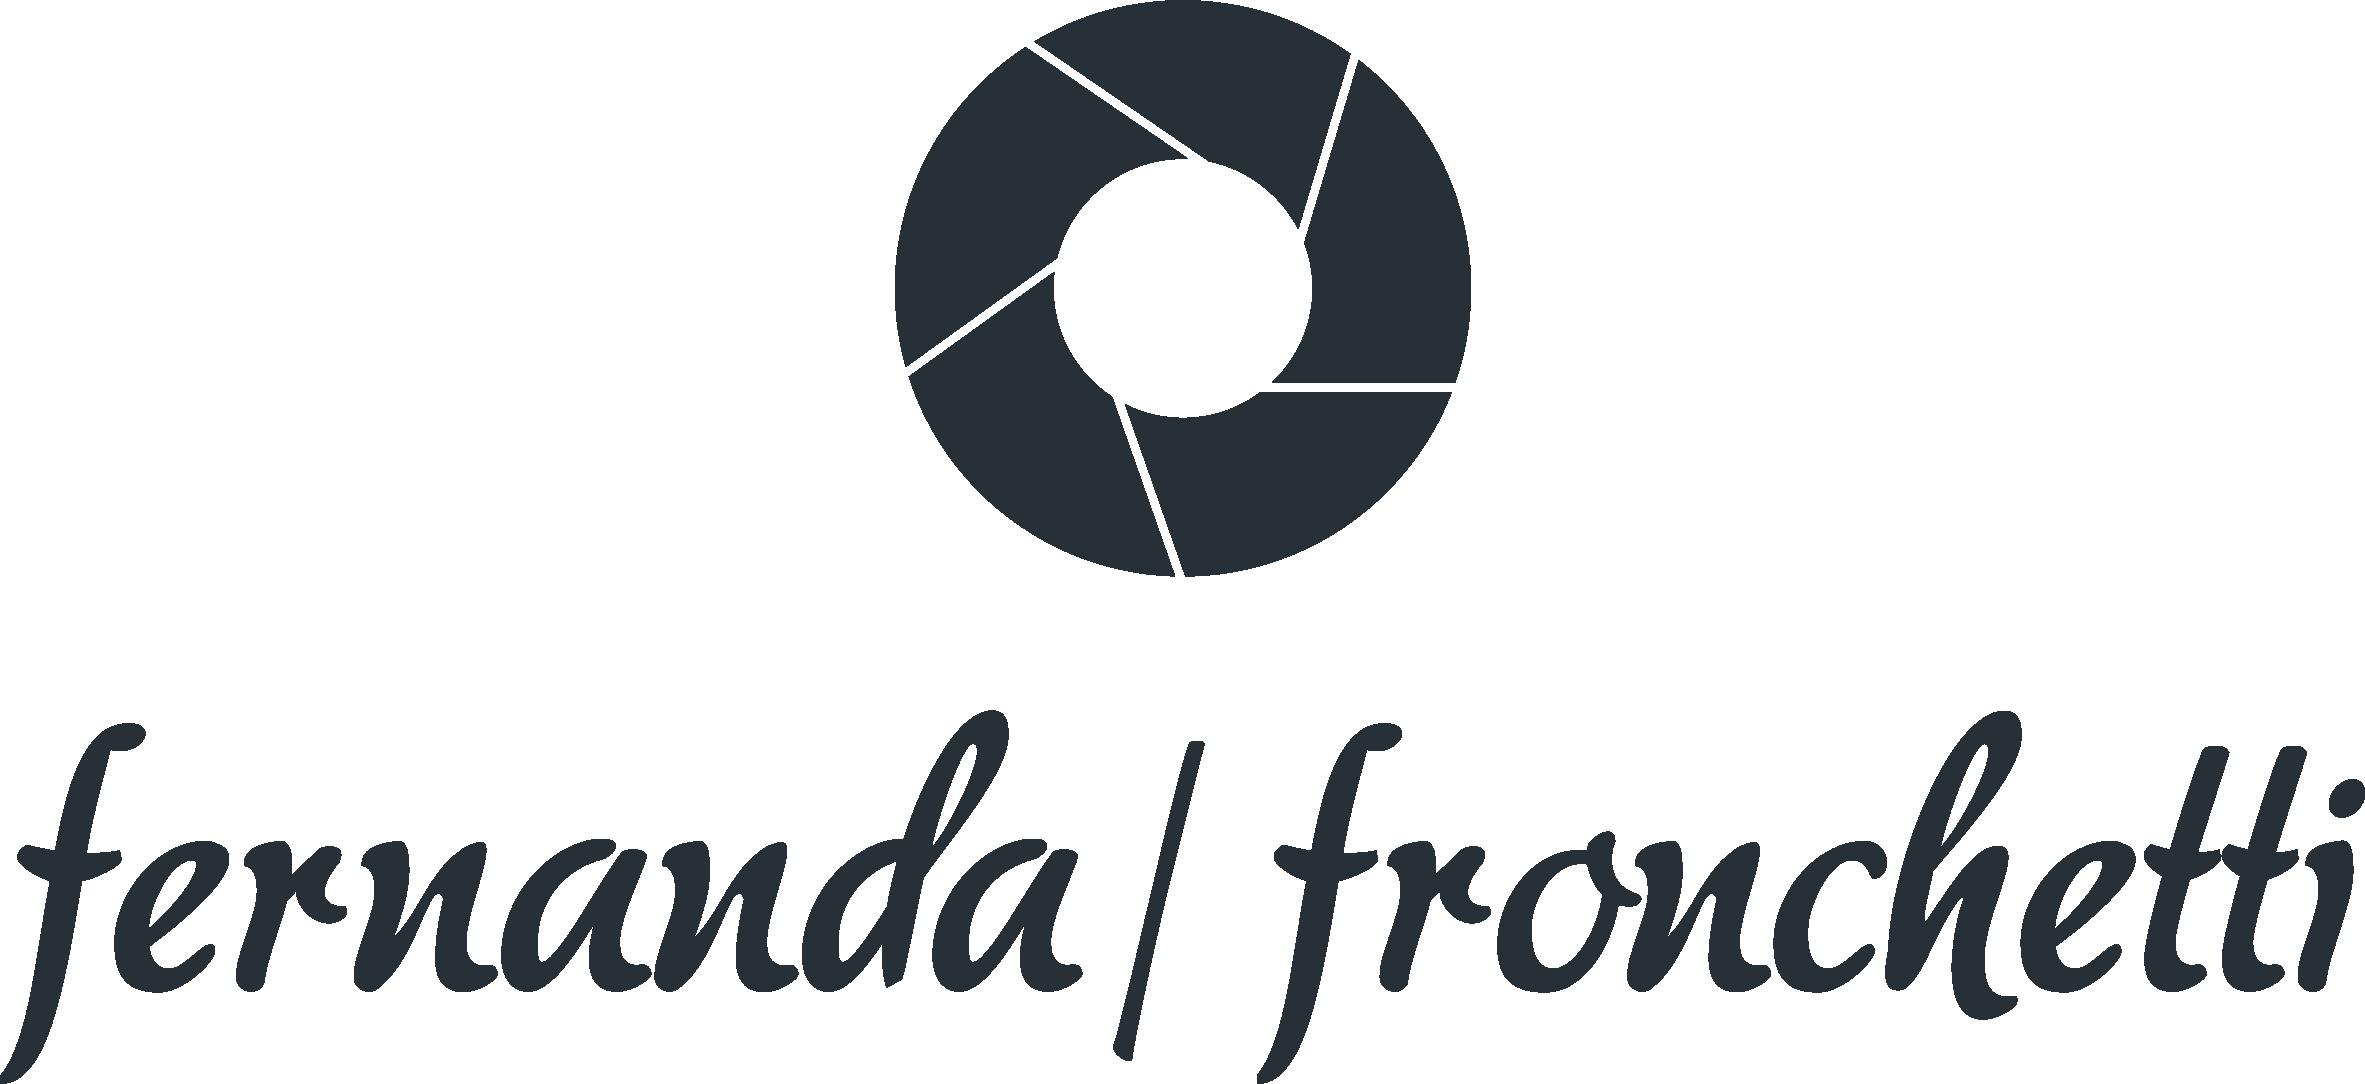 Fernanda Fronchetti